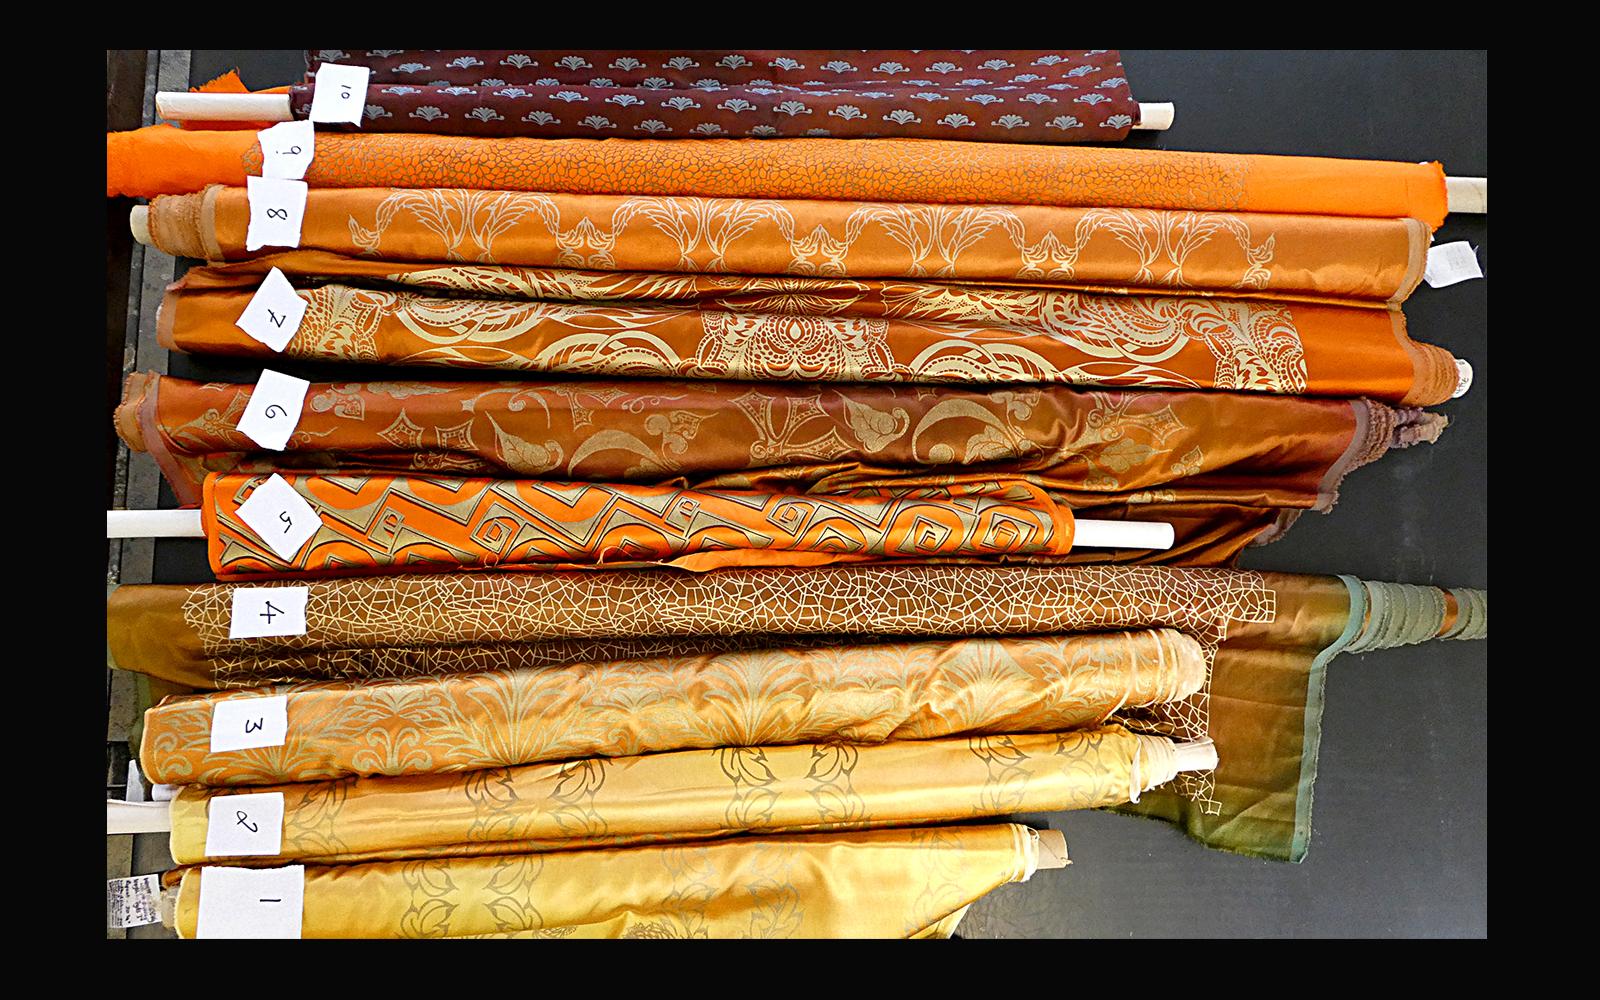 Fabric remnants drama opera golds ginger orange